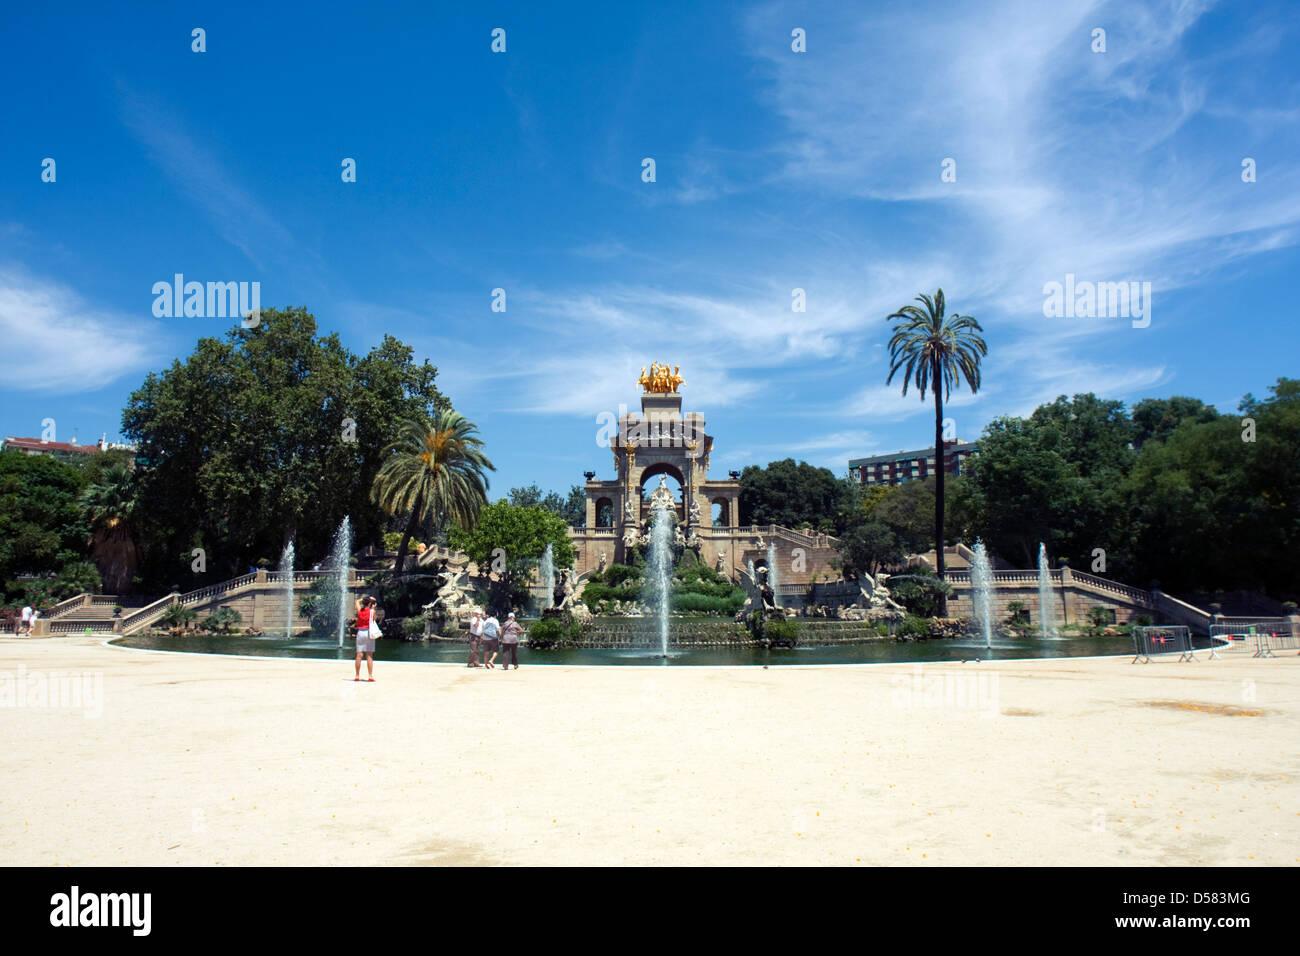 Fountain in Parc de la Ciutadella, Barcelona, Spain - Stock Image